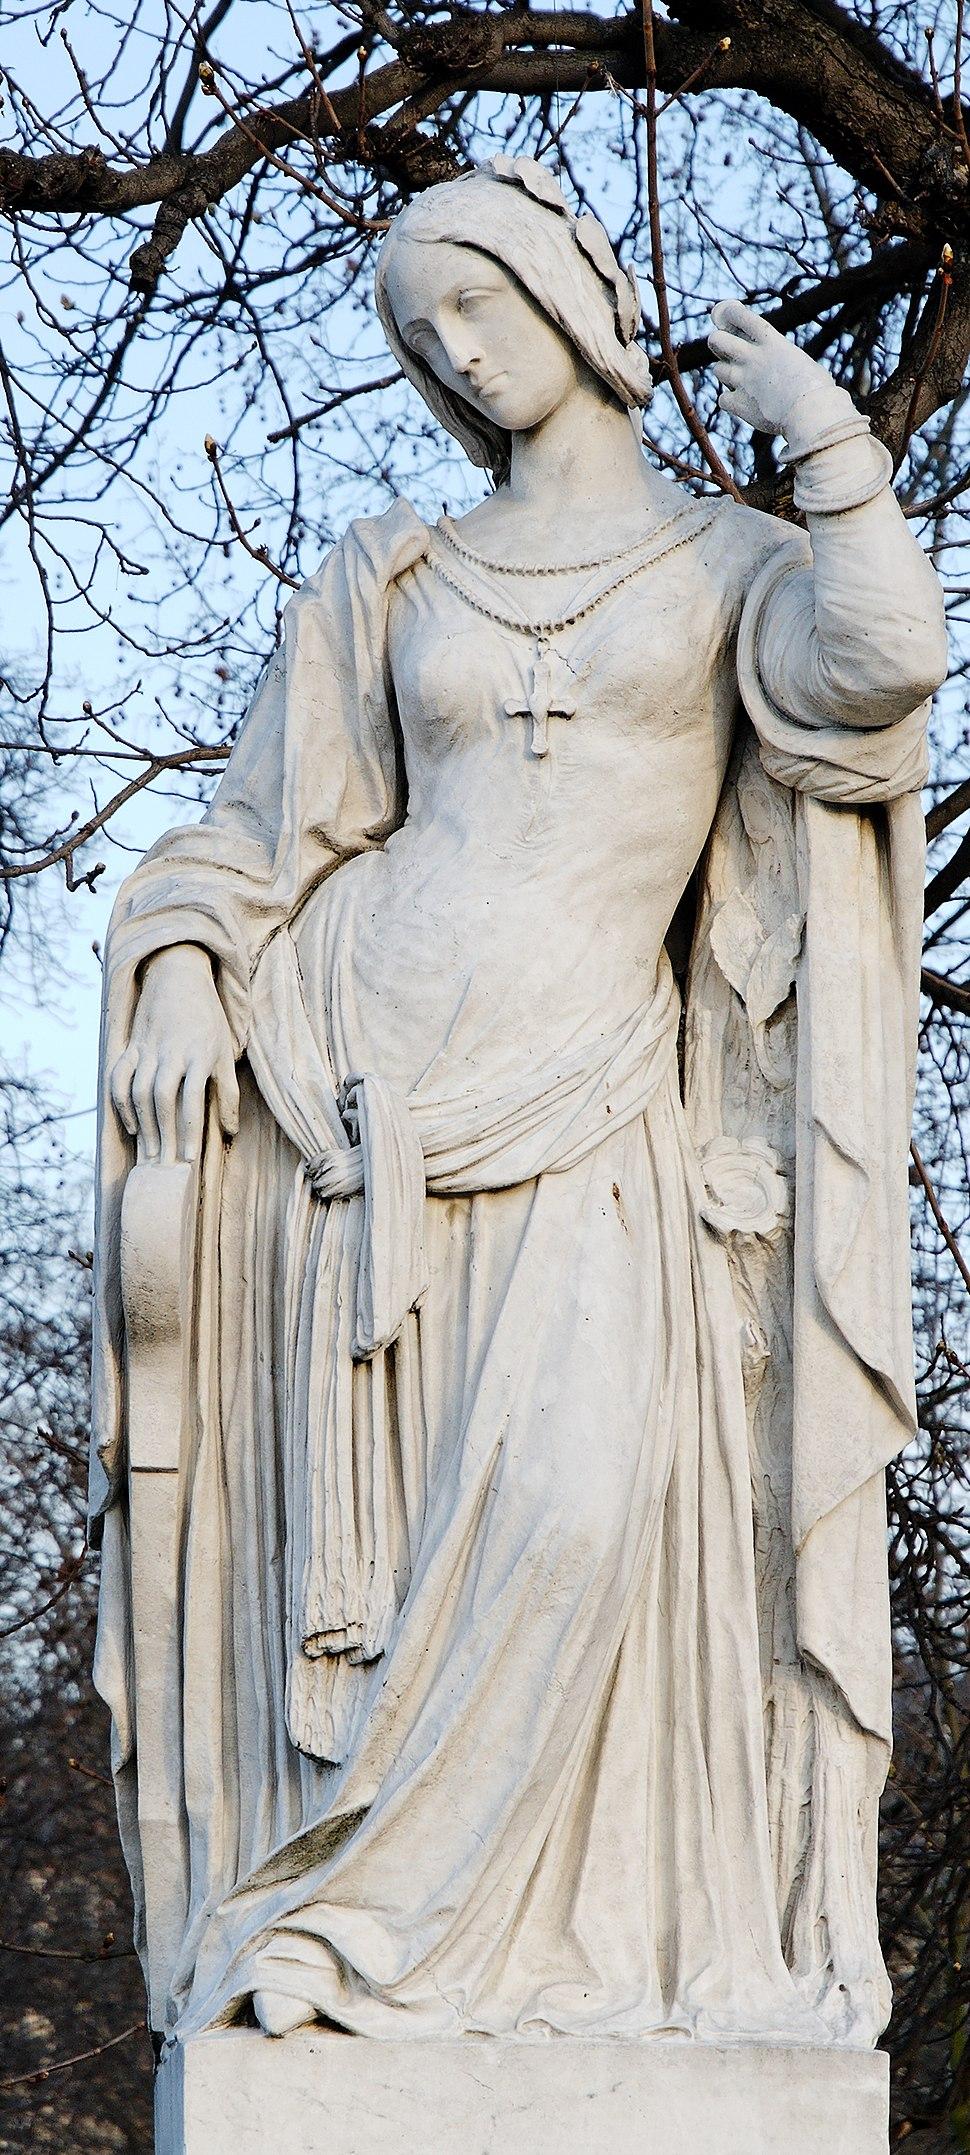 Clemence Isaure Jardin du Luxembourg